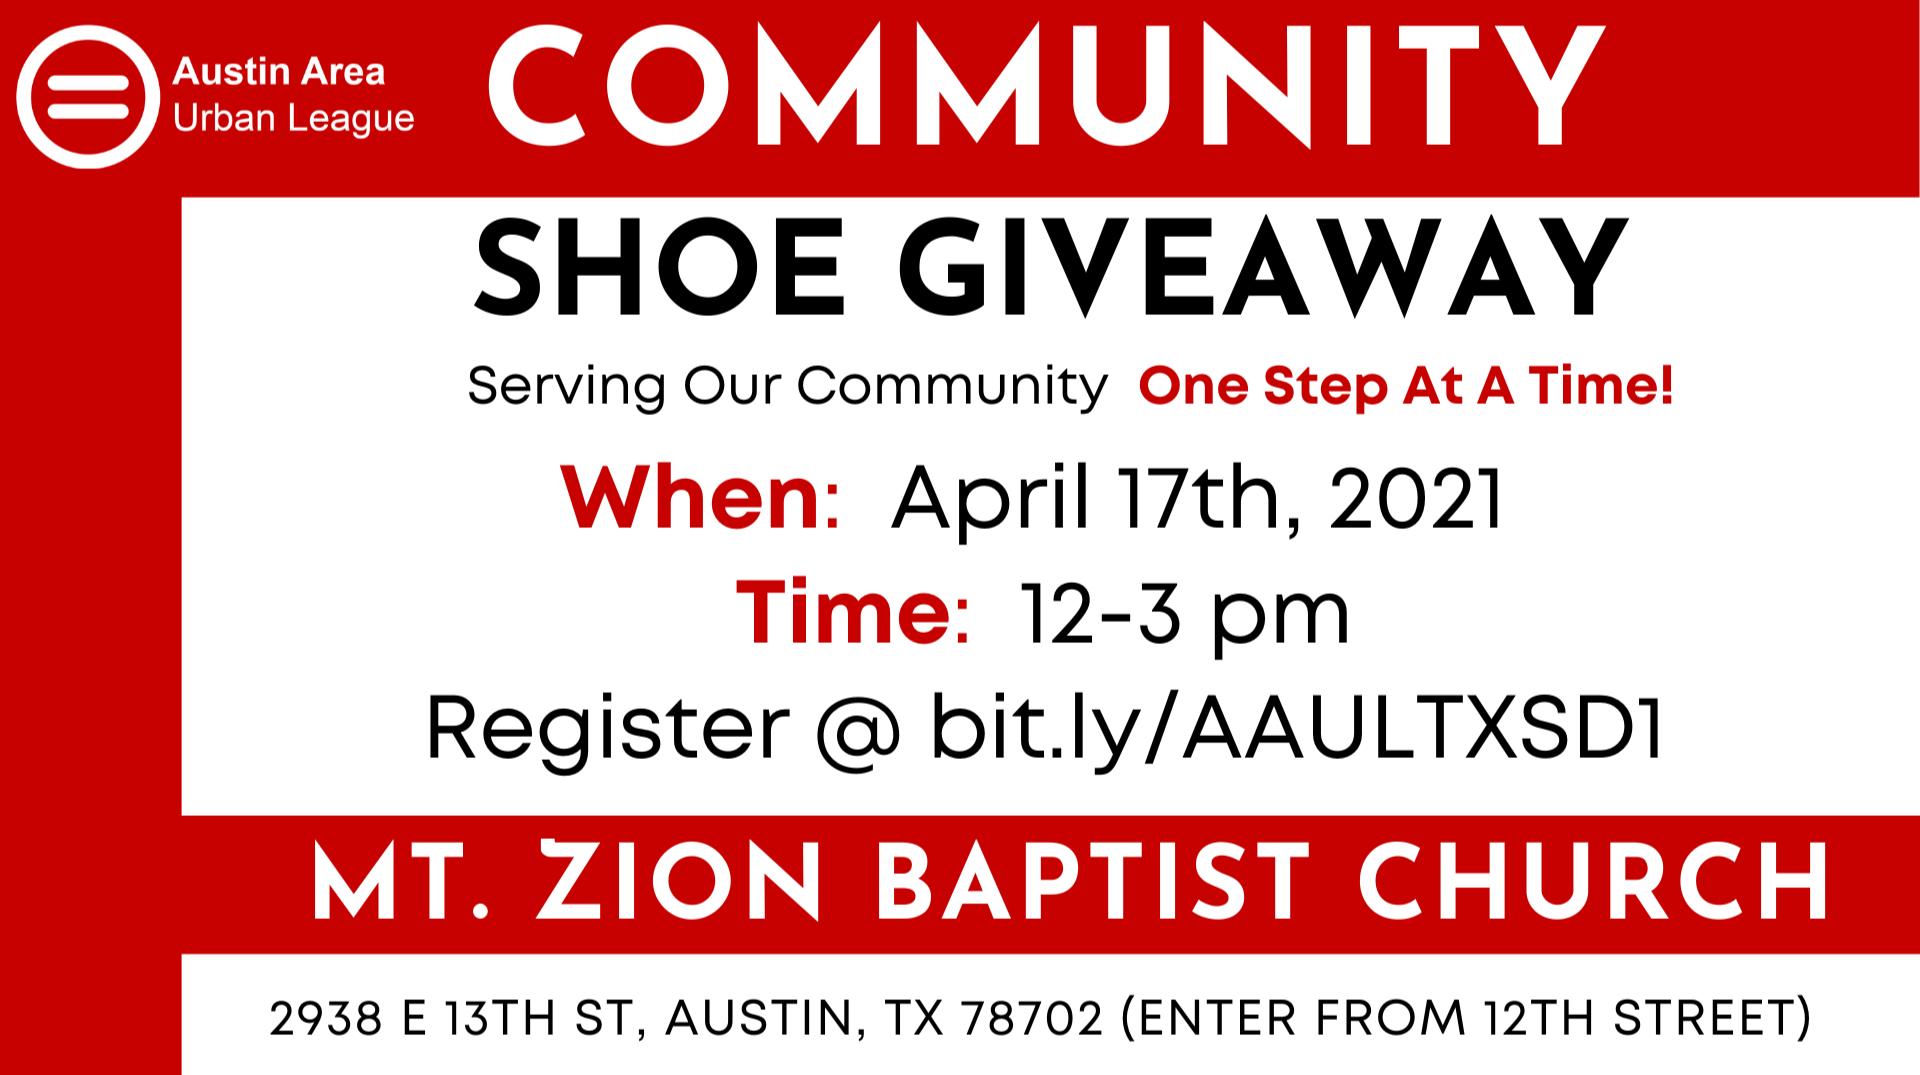 Shoe Drive Community Canvassing